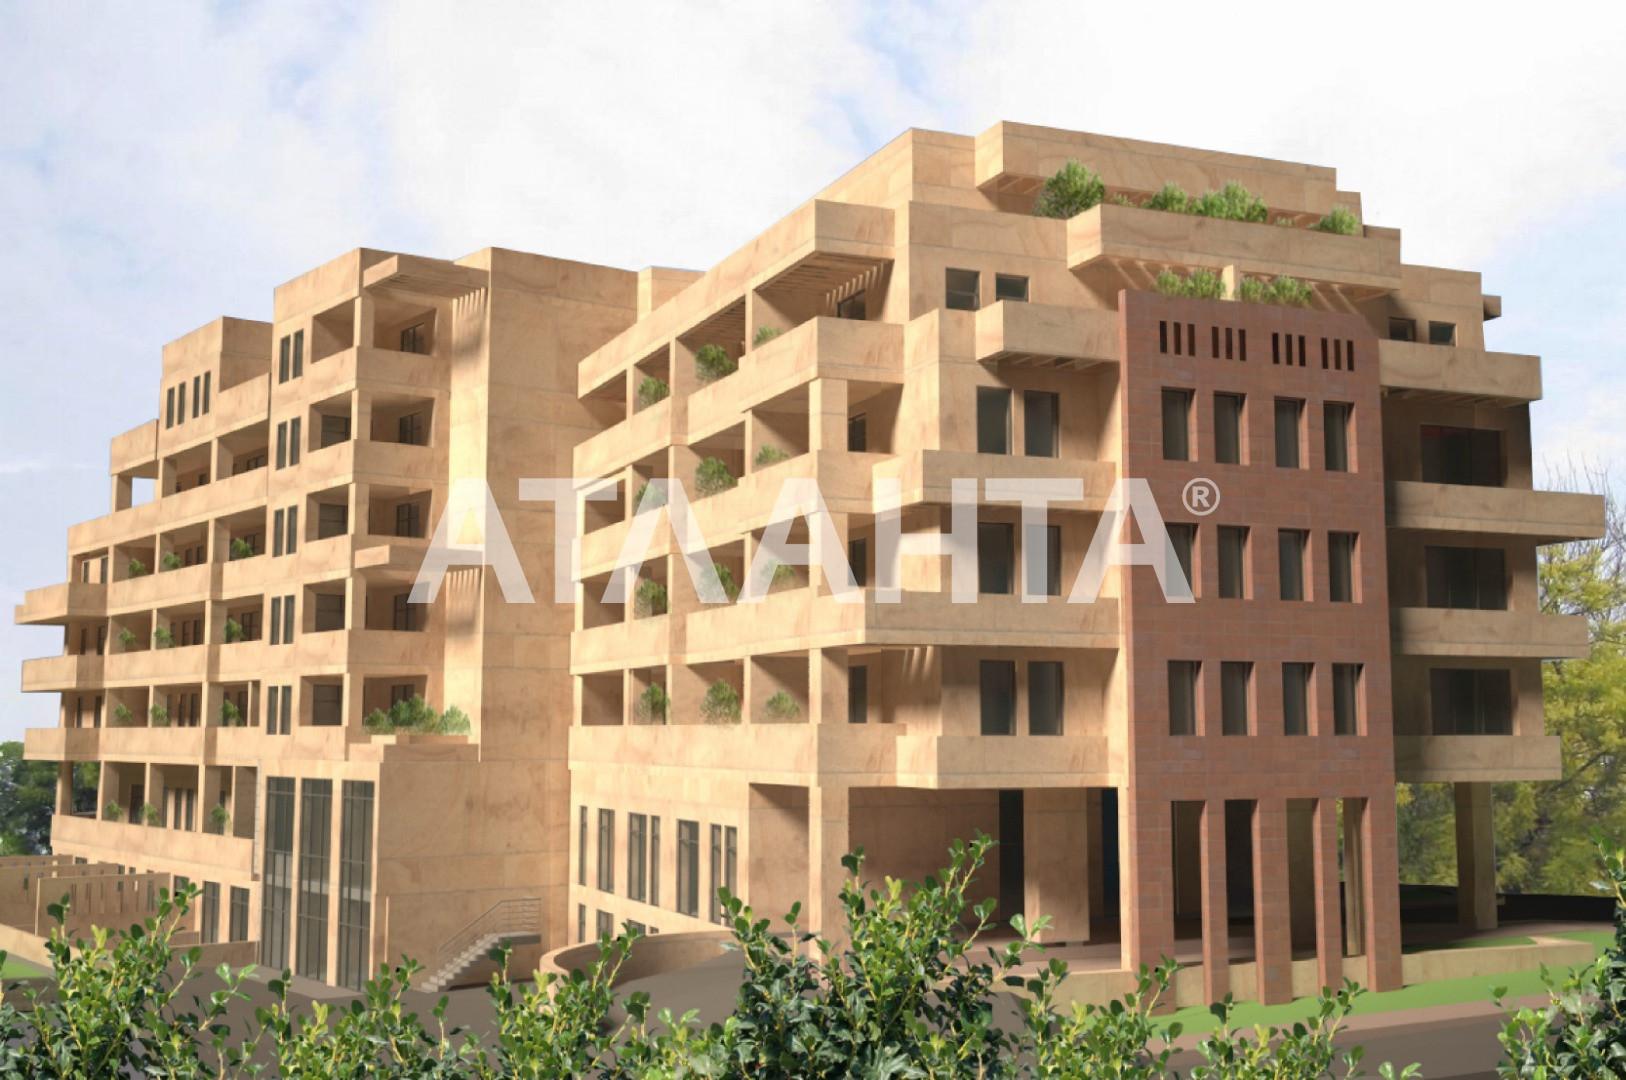 Продается 1-комнатная Квартира на ул. Каманина — 47 540 у.е.